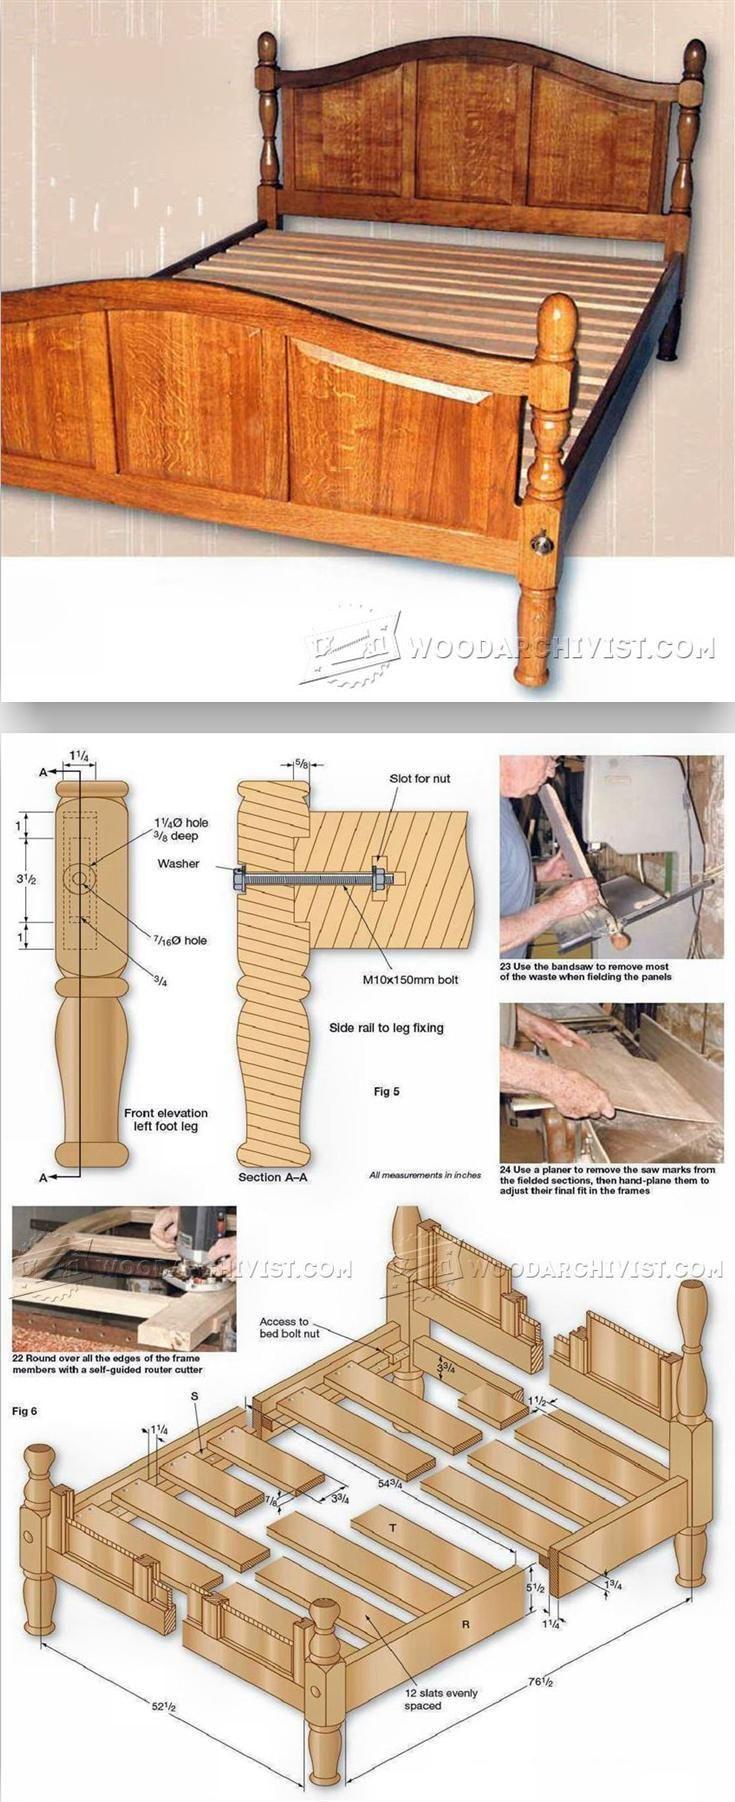 Oak Bed Plans - Furniture Plans and Projects   WoodArchivist.com